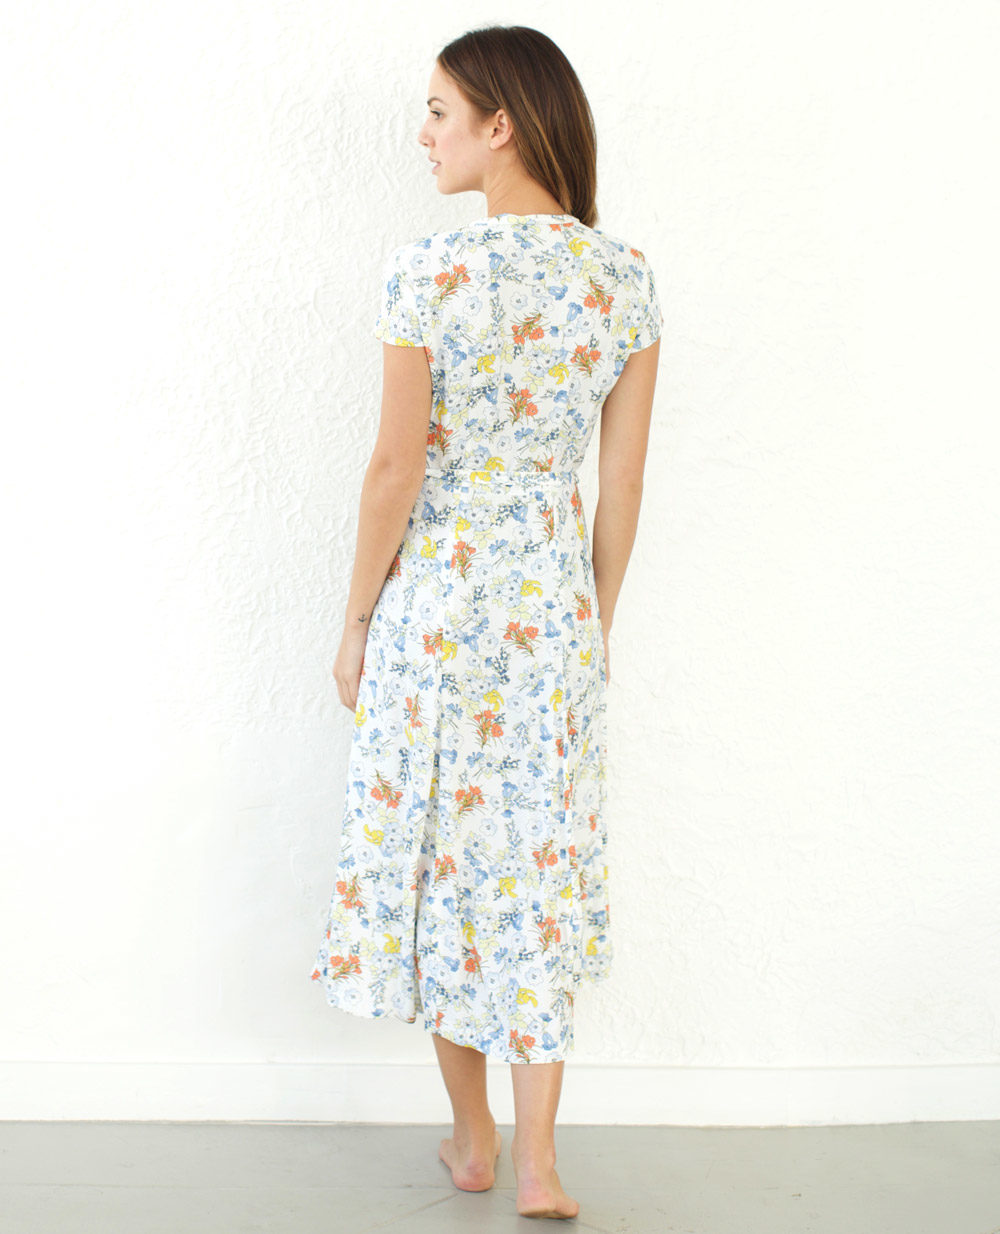 TheClothespinn.com Colette Dress Summerland Print